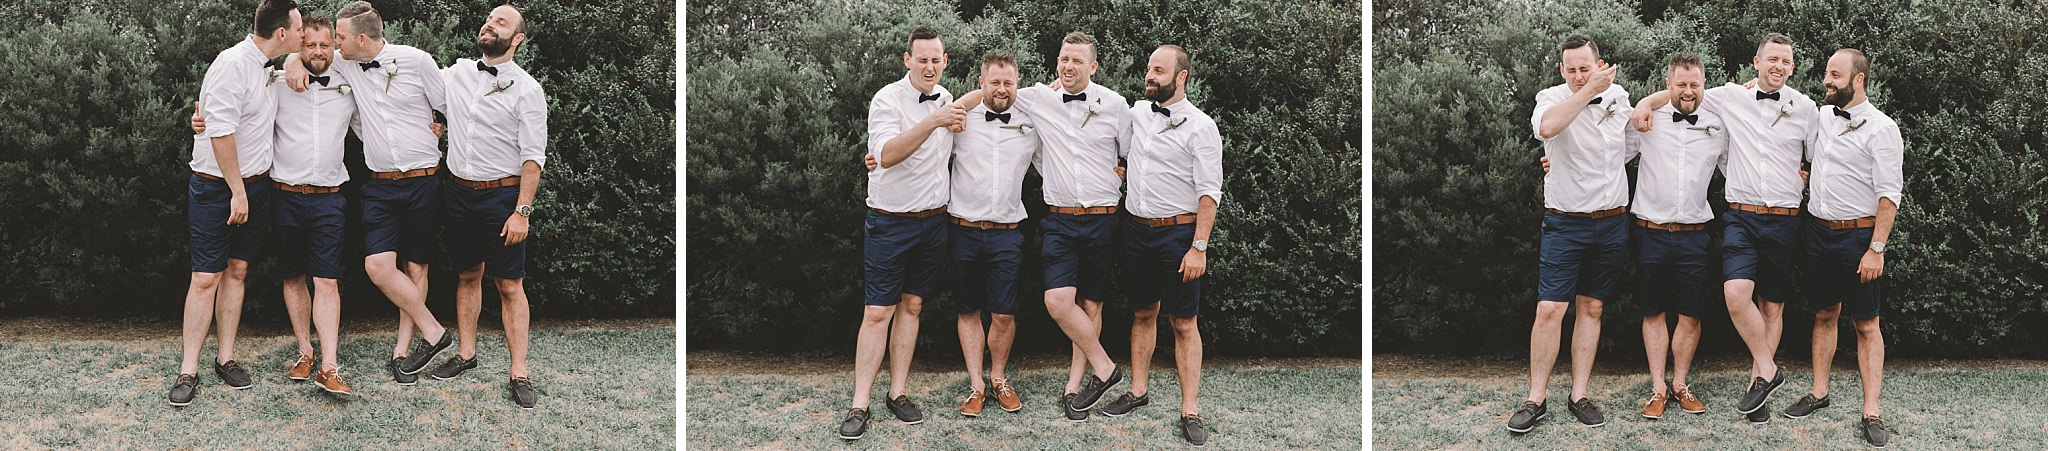 Mornington Peninsula Wedding Photographer 118.JPG